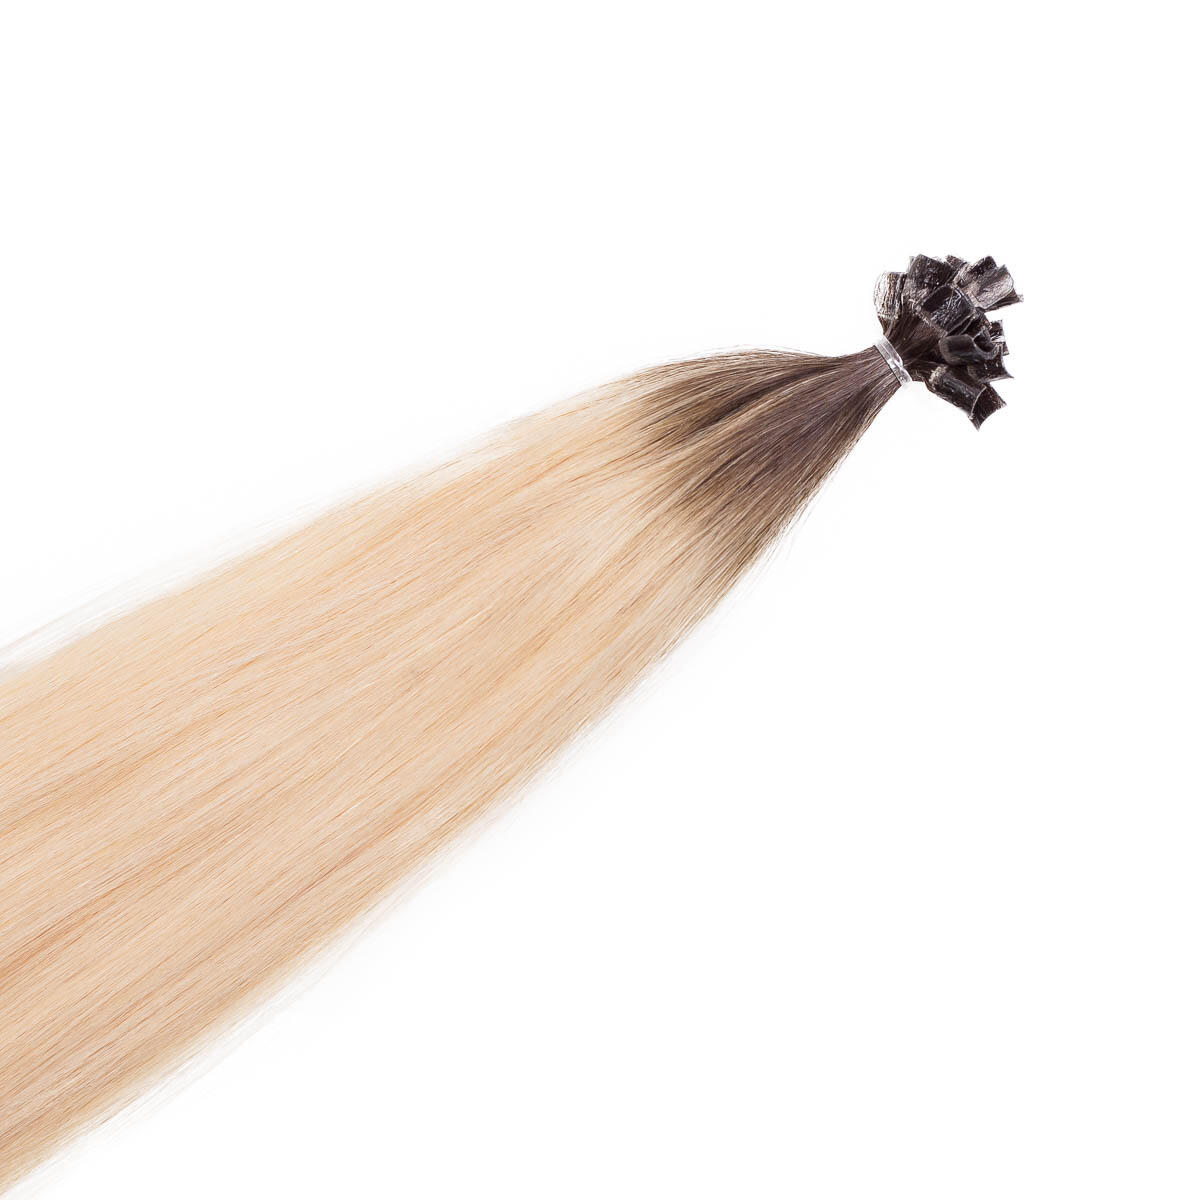 Nail Hair Original R2.6/8.0 Dark Ash Blonde Root 50 cm